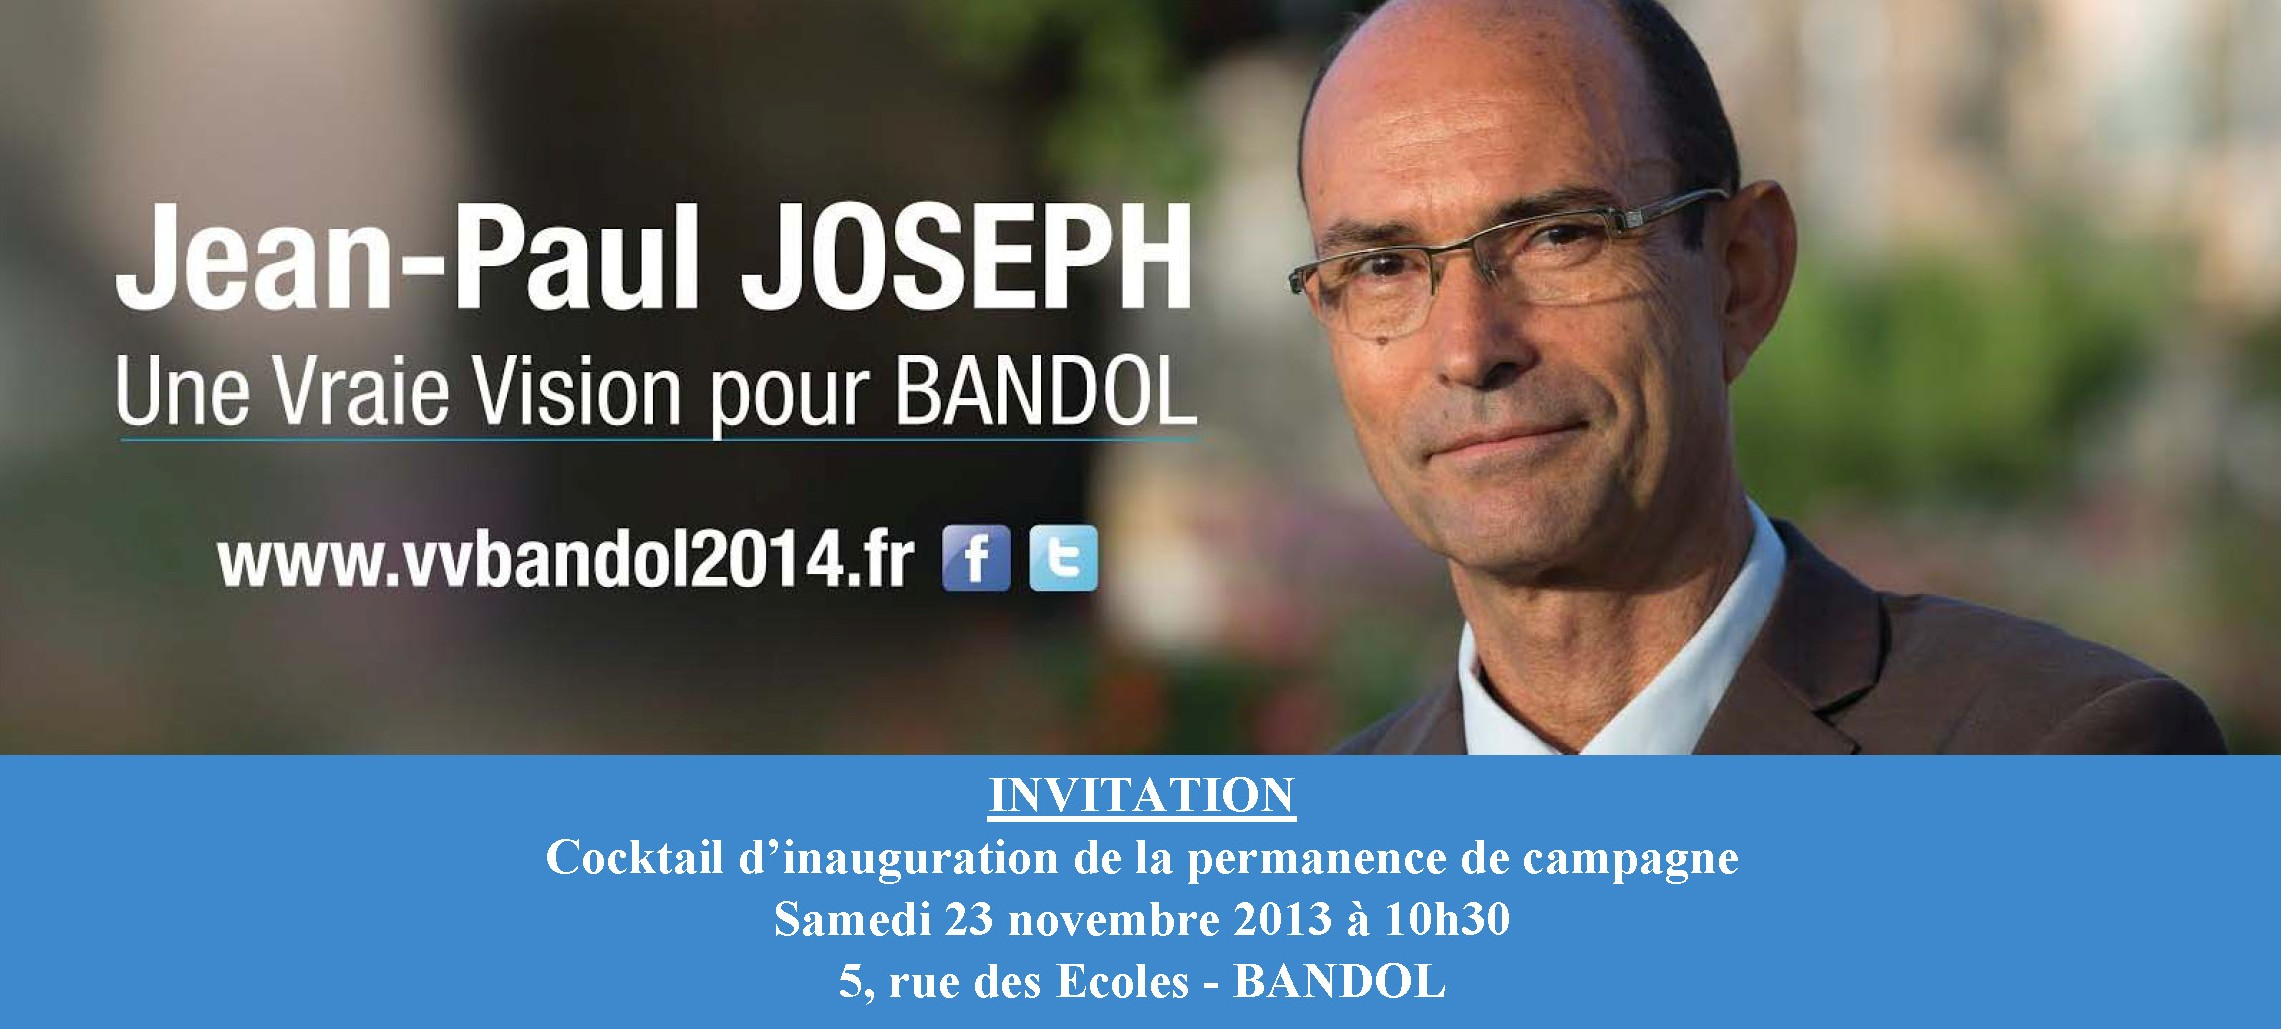 Invitation Inauguration Permanence (23-11-13)(2)